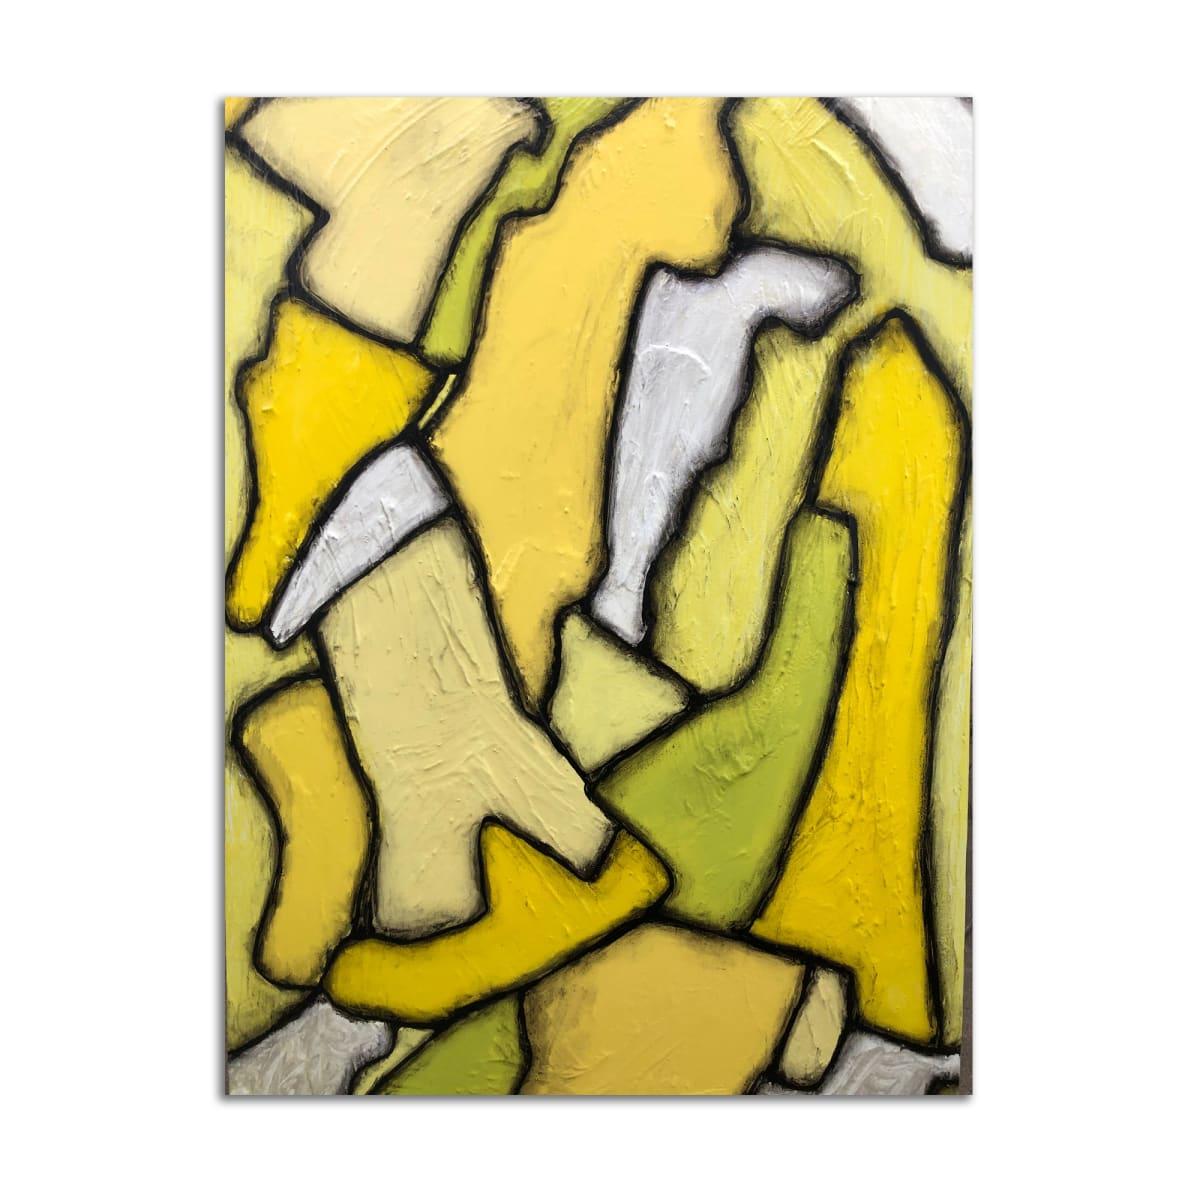 Yellow Car by Dustin Burgert